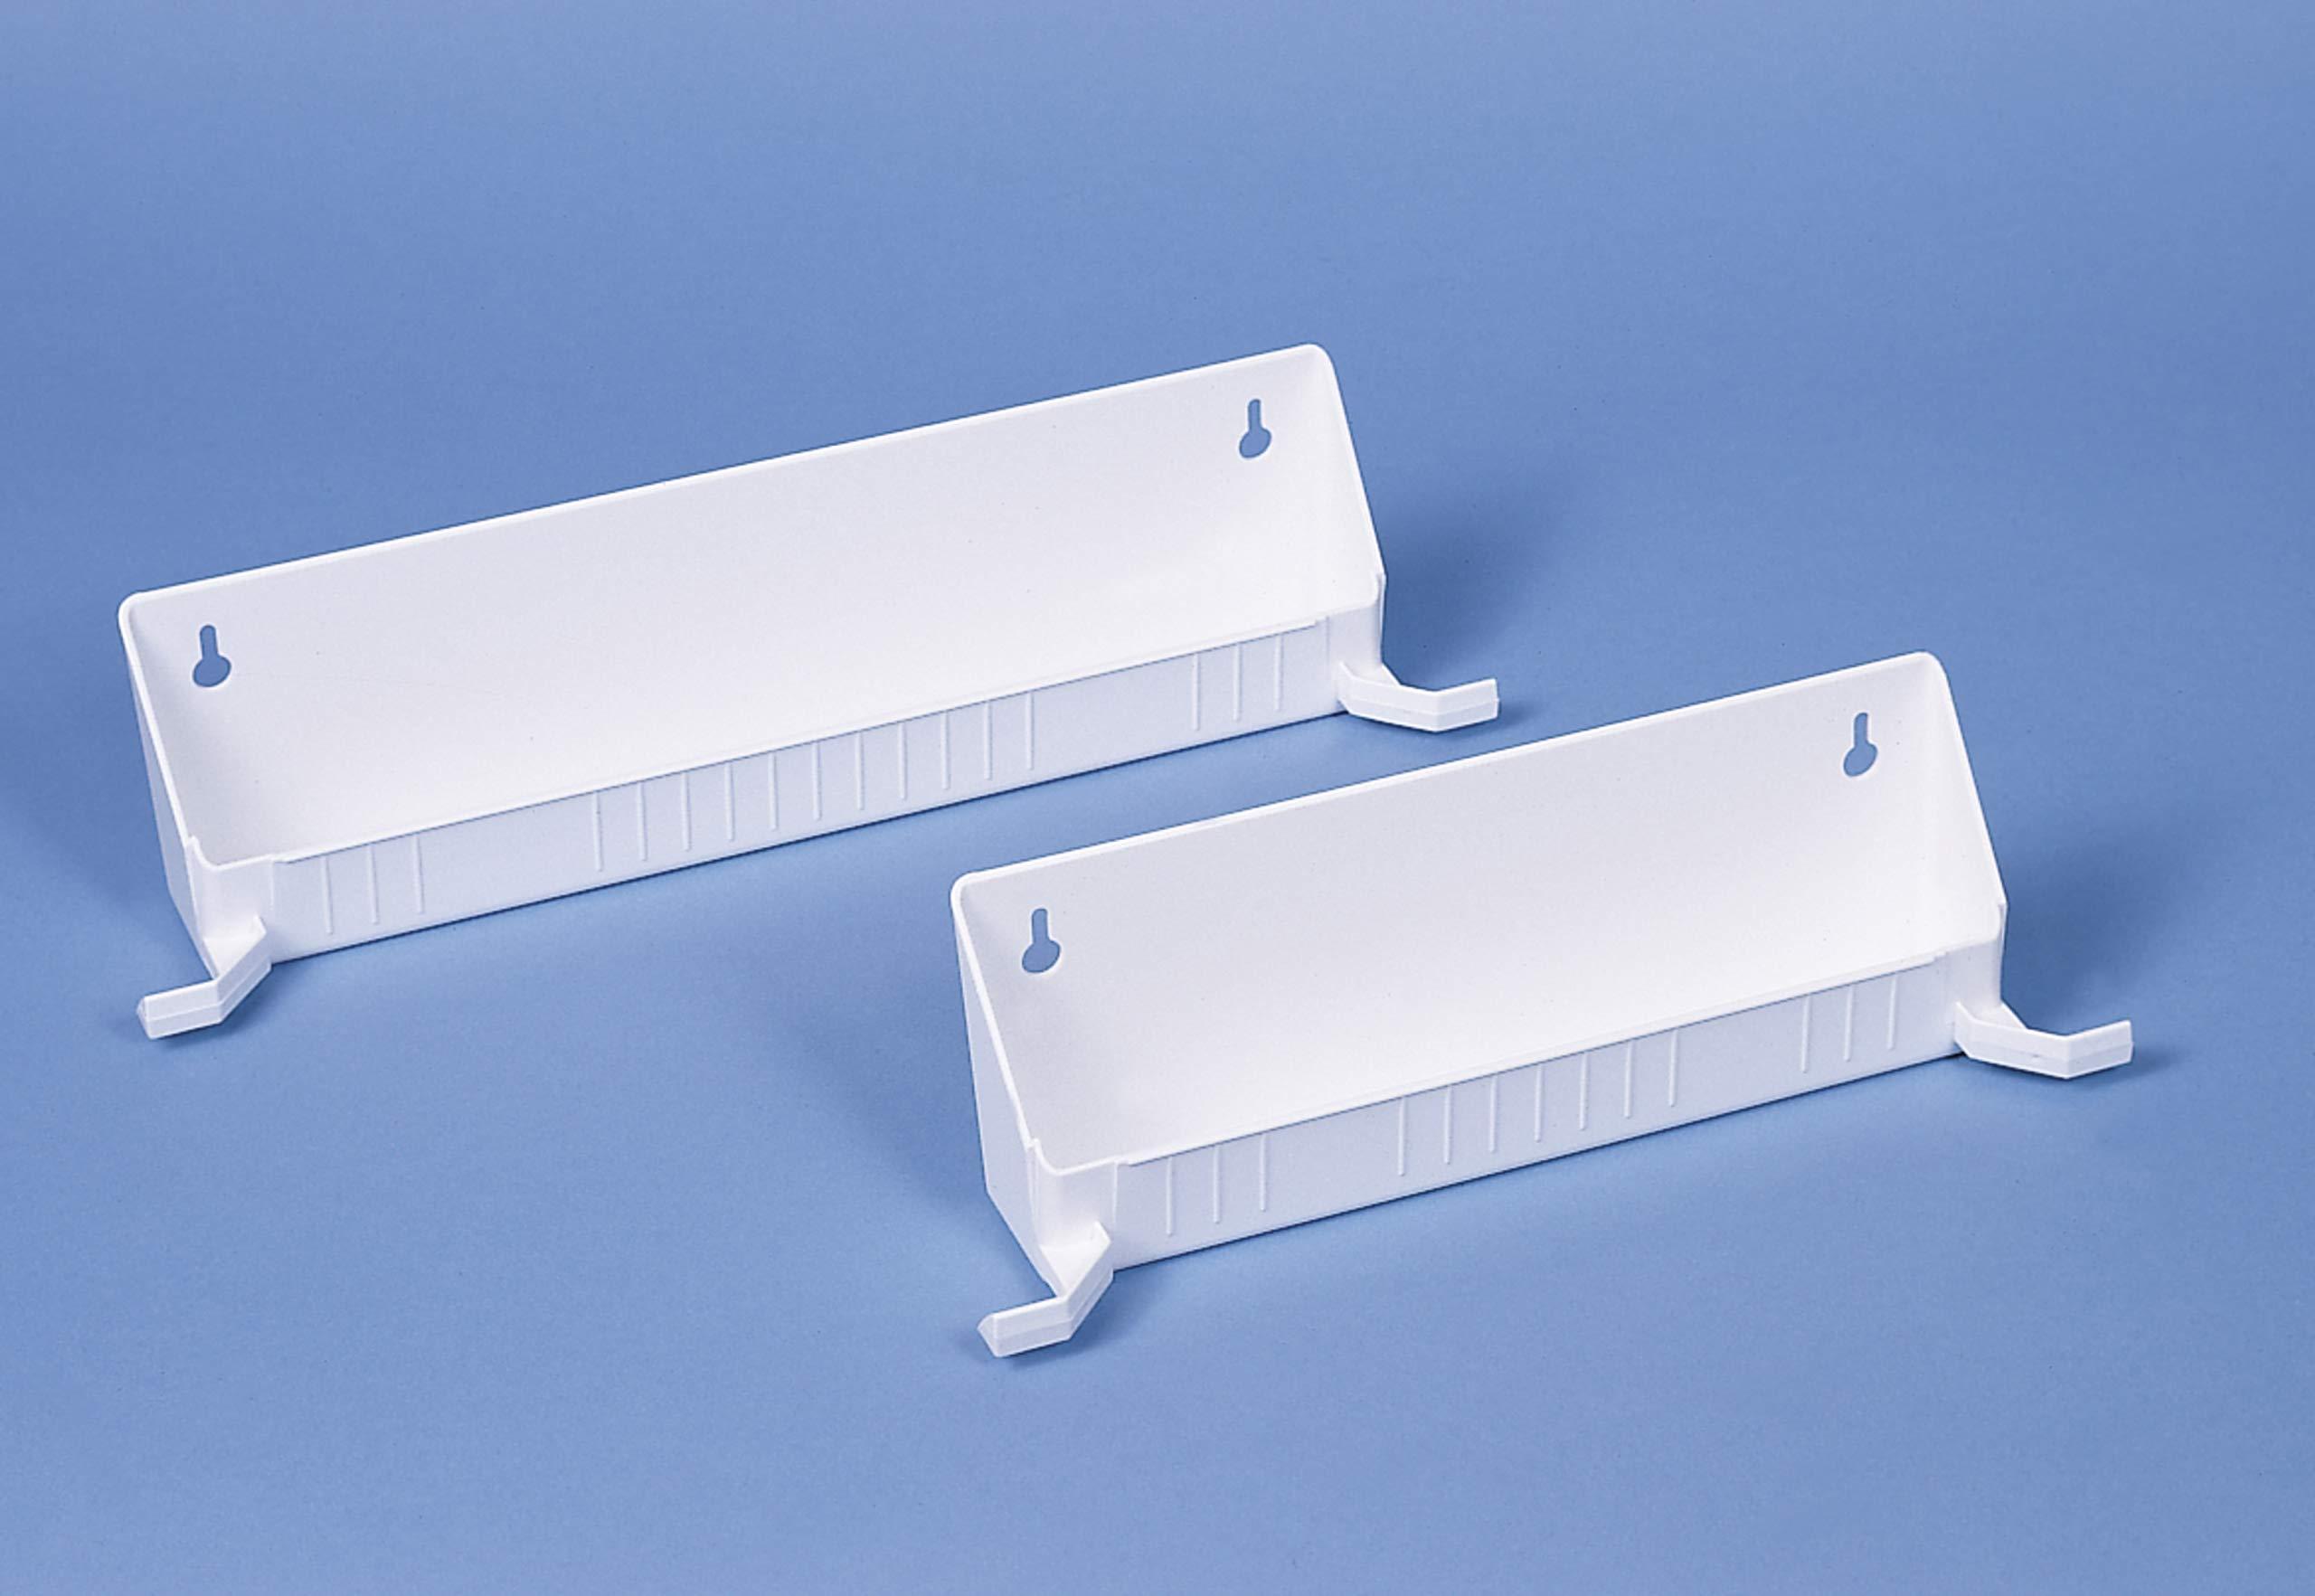 Rev-A-Shelf 14 in Tip-Out Trays w/Tab Stops, White by Rev-A-Shelf